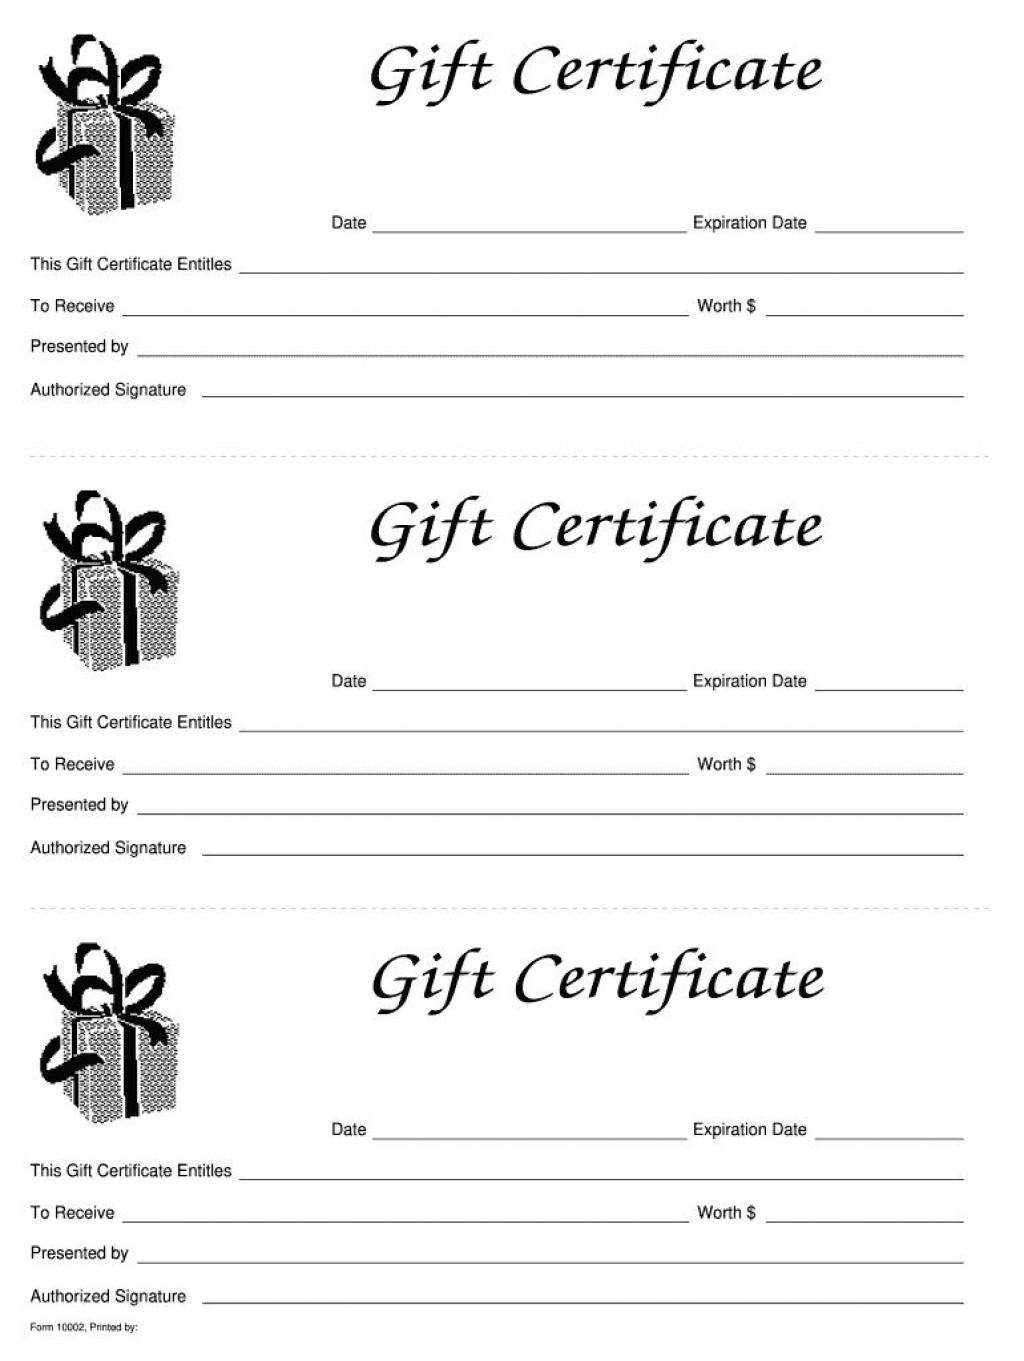 006 Simple Blank Gift Certificate Template Sample  Free Printable DownloadableLarge